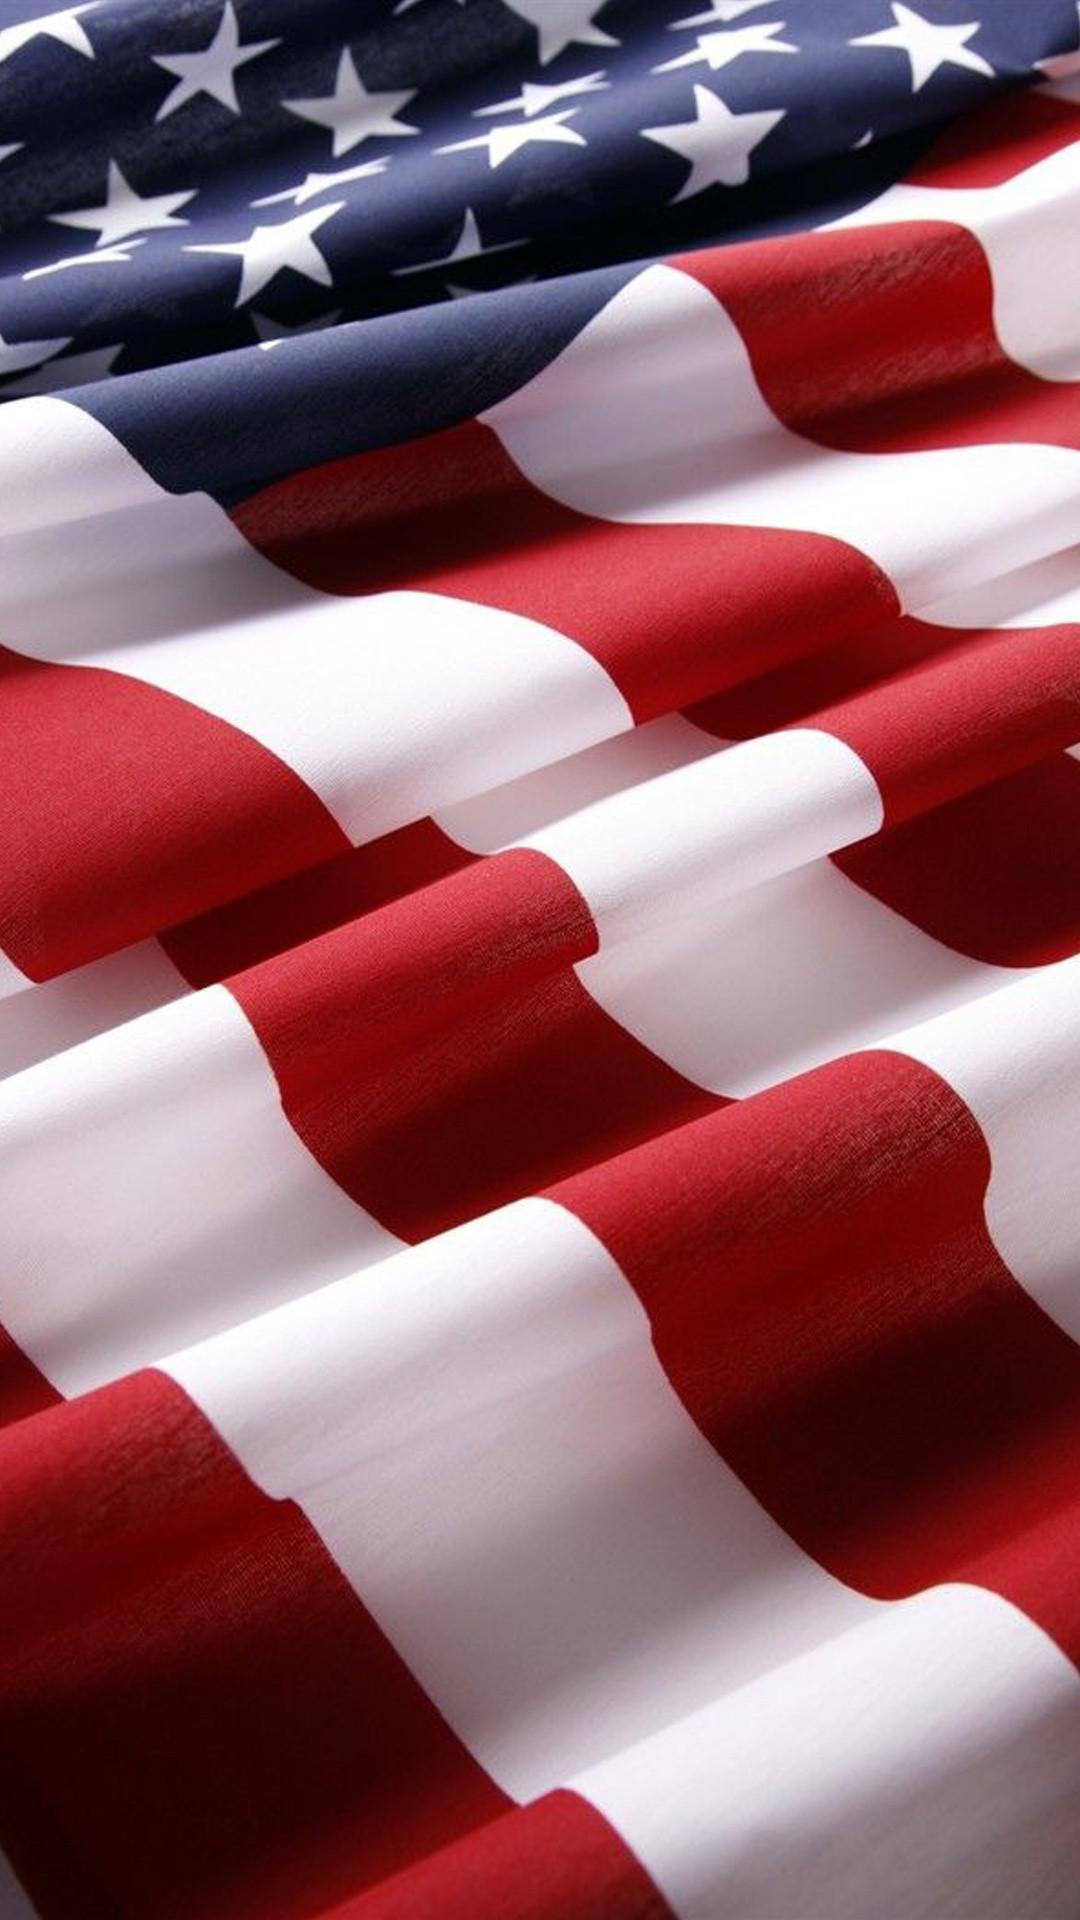 American Flag wallpapers iphone se American Flag wallpapers For iphone se